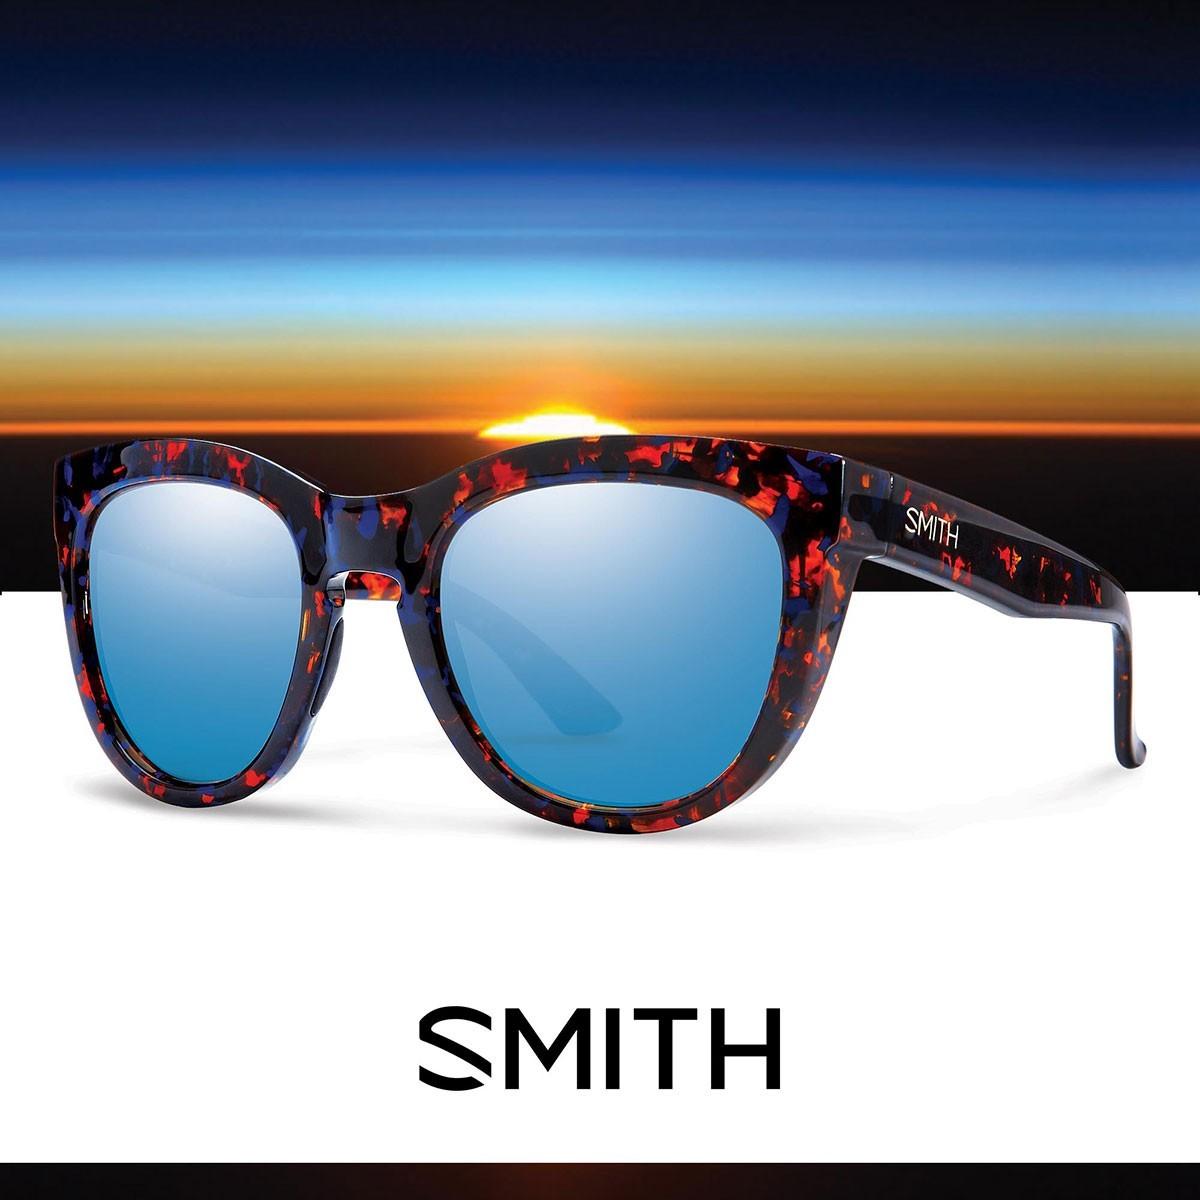 SMITH SIDNEY flecked blue tortoise - Изображение - AQUAMATRIX